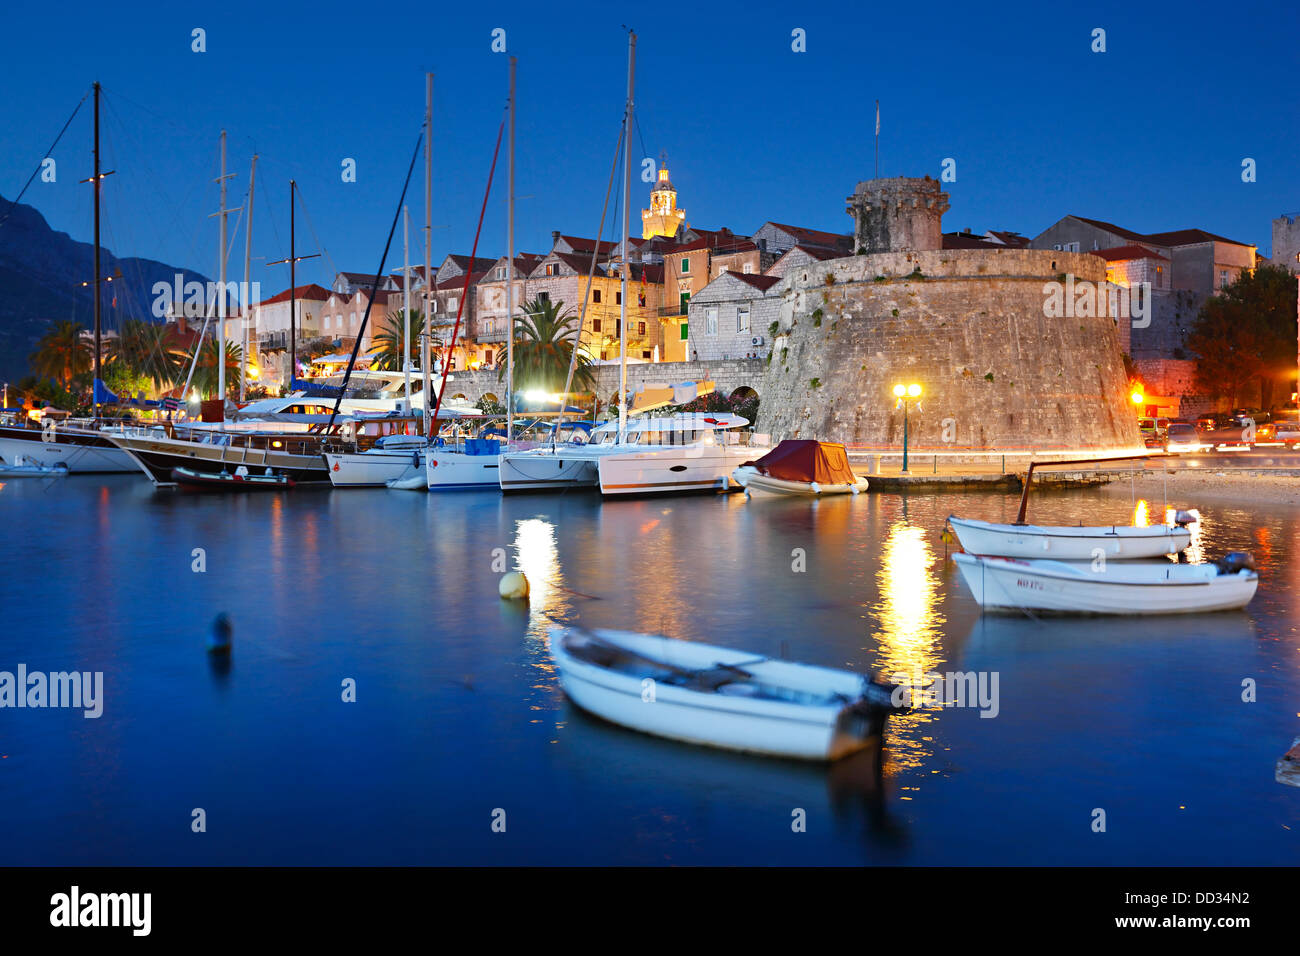 Korcula town, Croatia - Stock Image